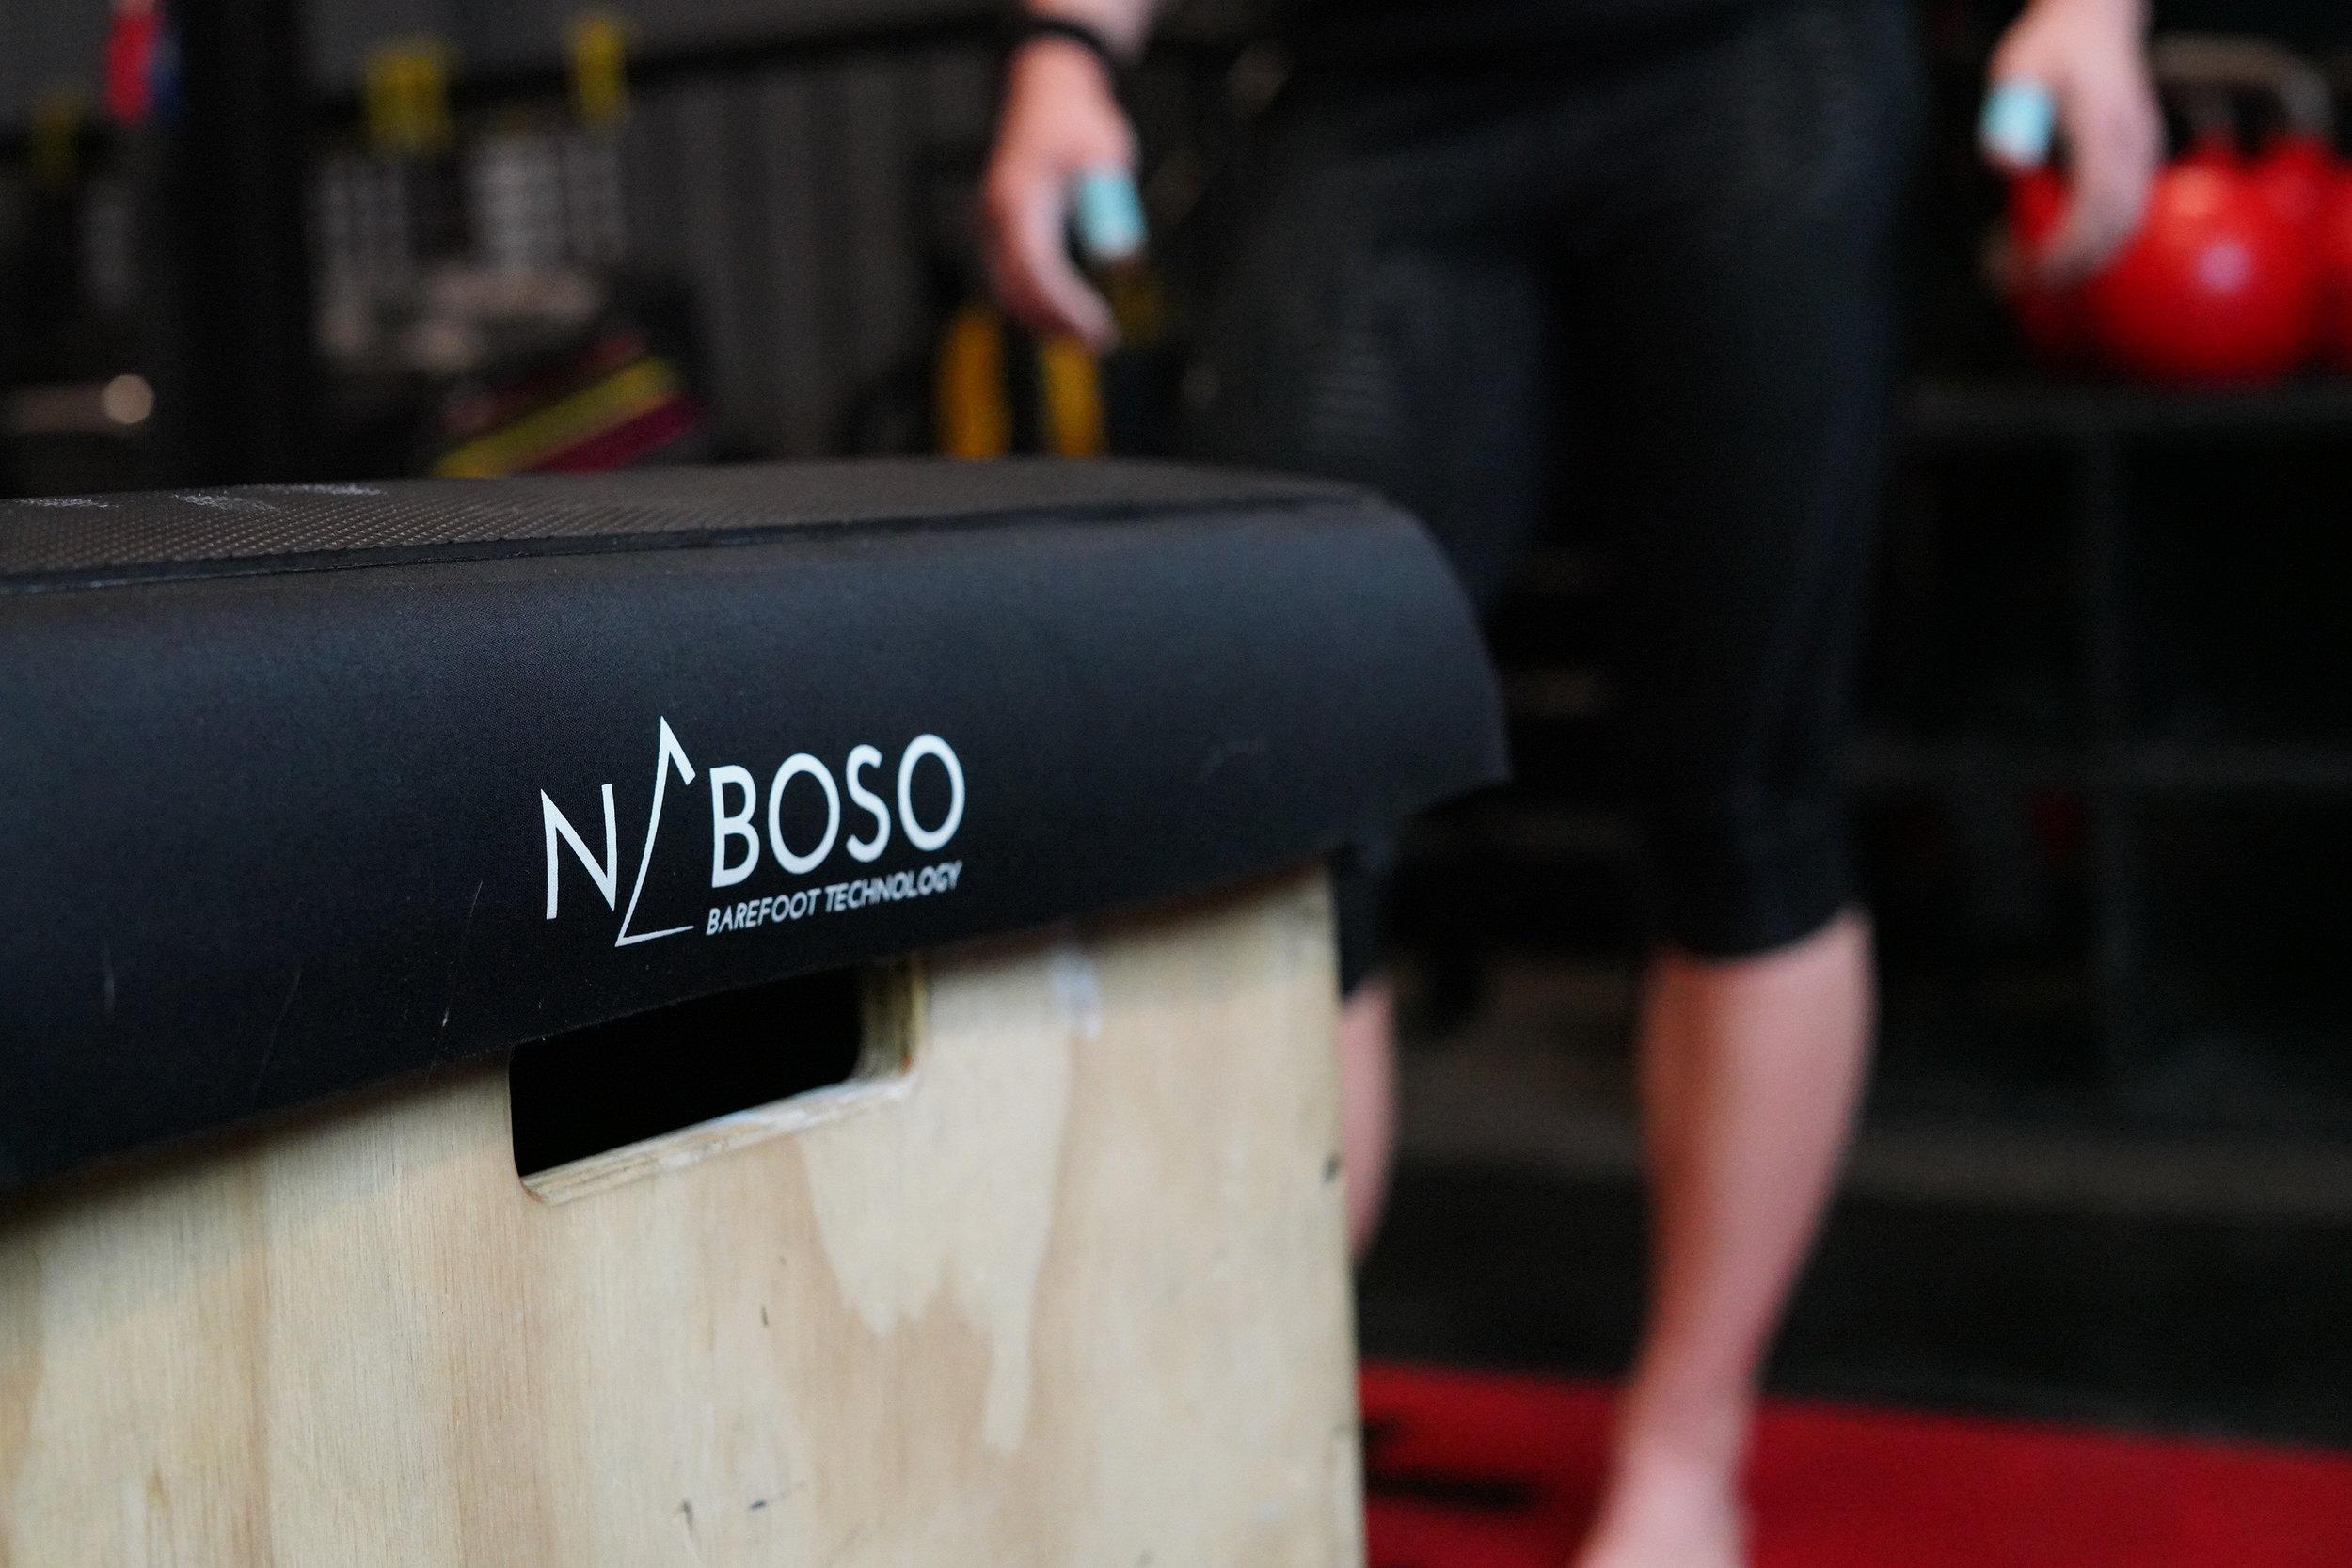 naboso box.JPG